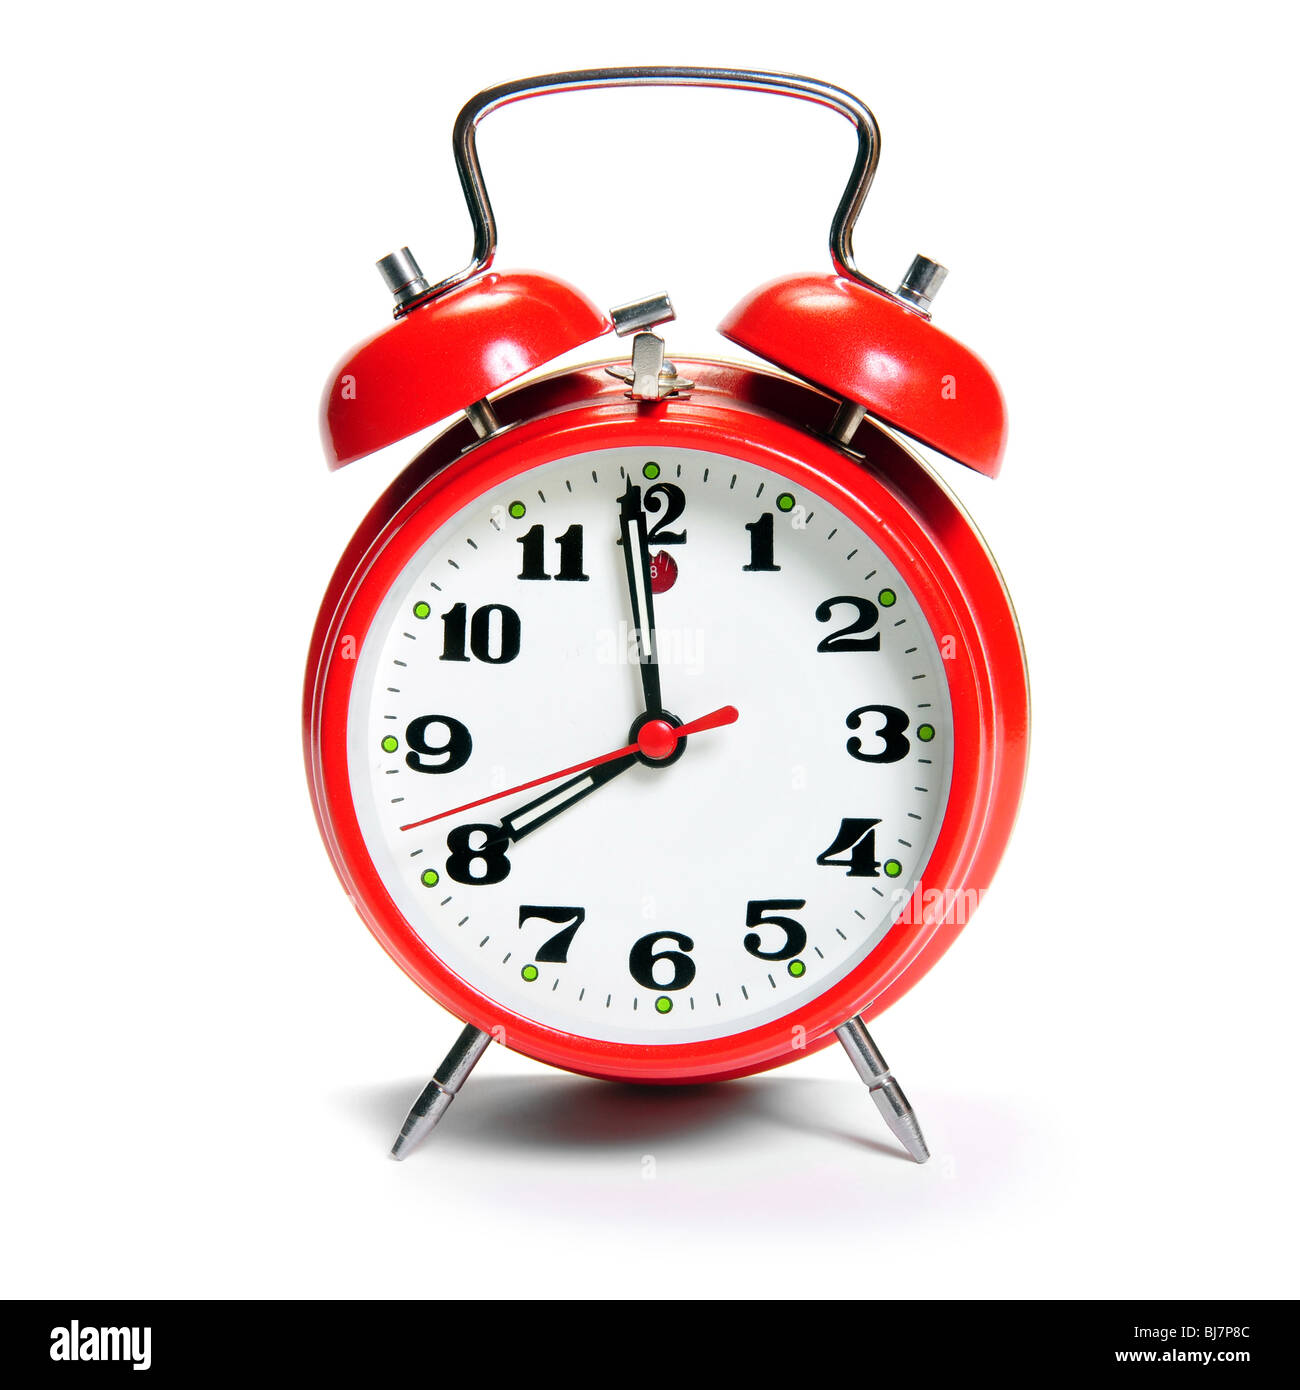 Antiguo reloj despertador moda aislado en blanco Imagen De Stock